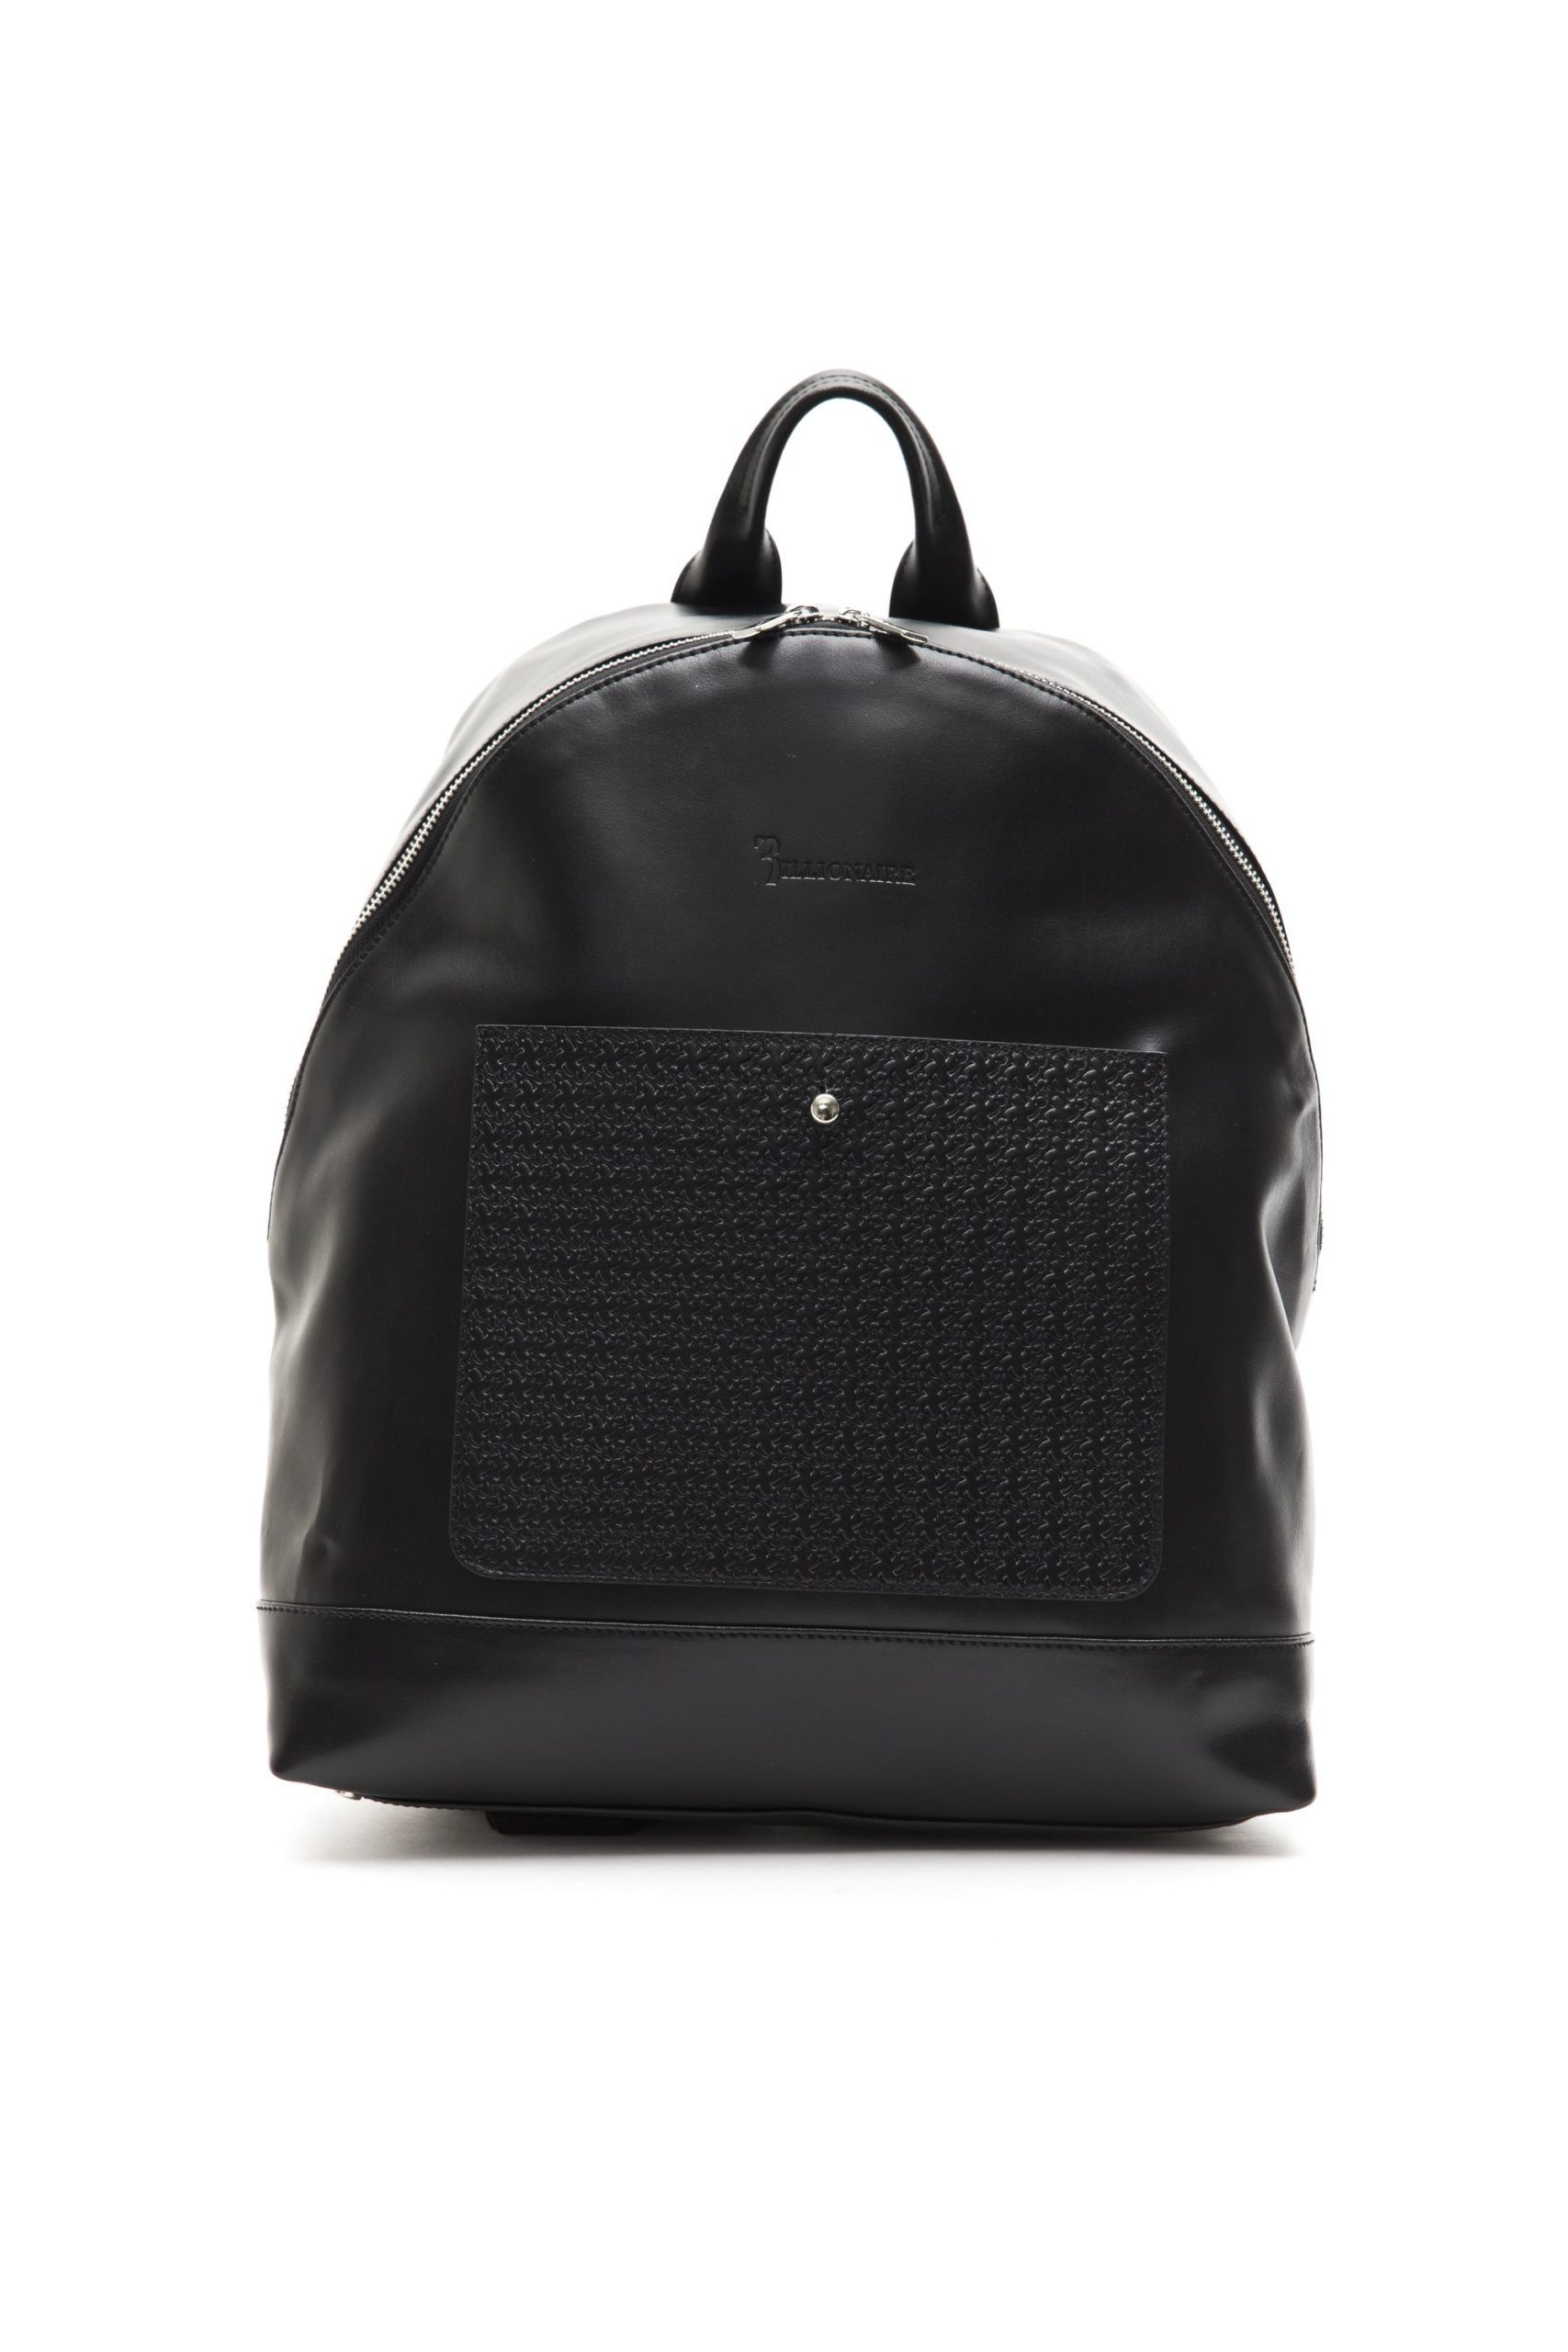 Billionaire Italian Couture Men's Nero Backpack Black BI1004091